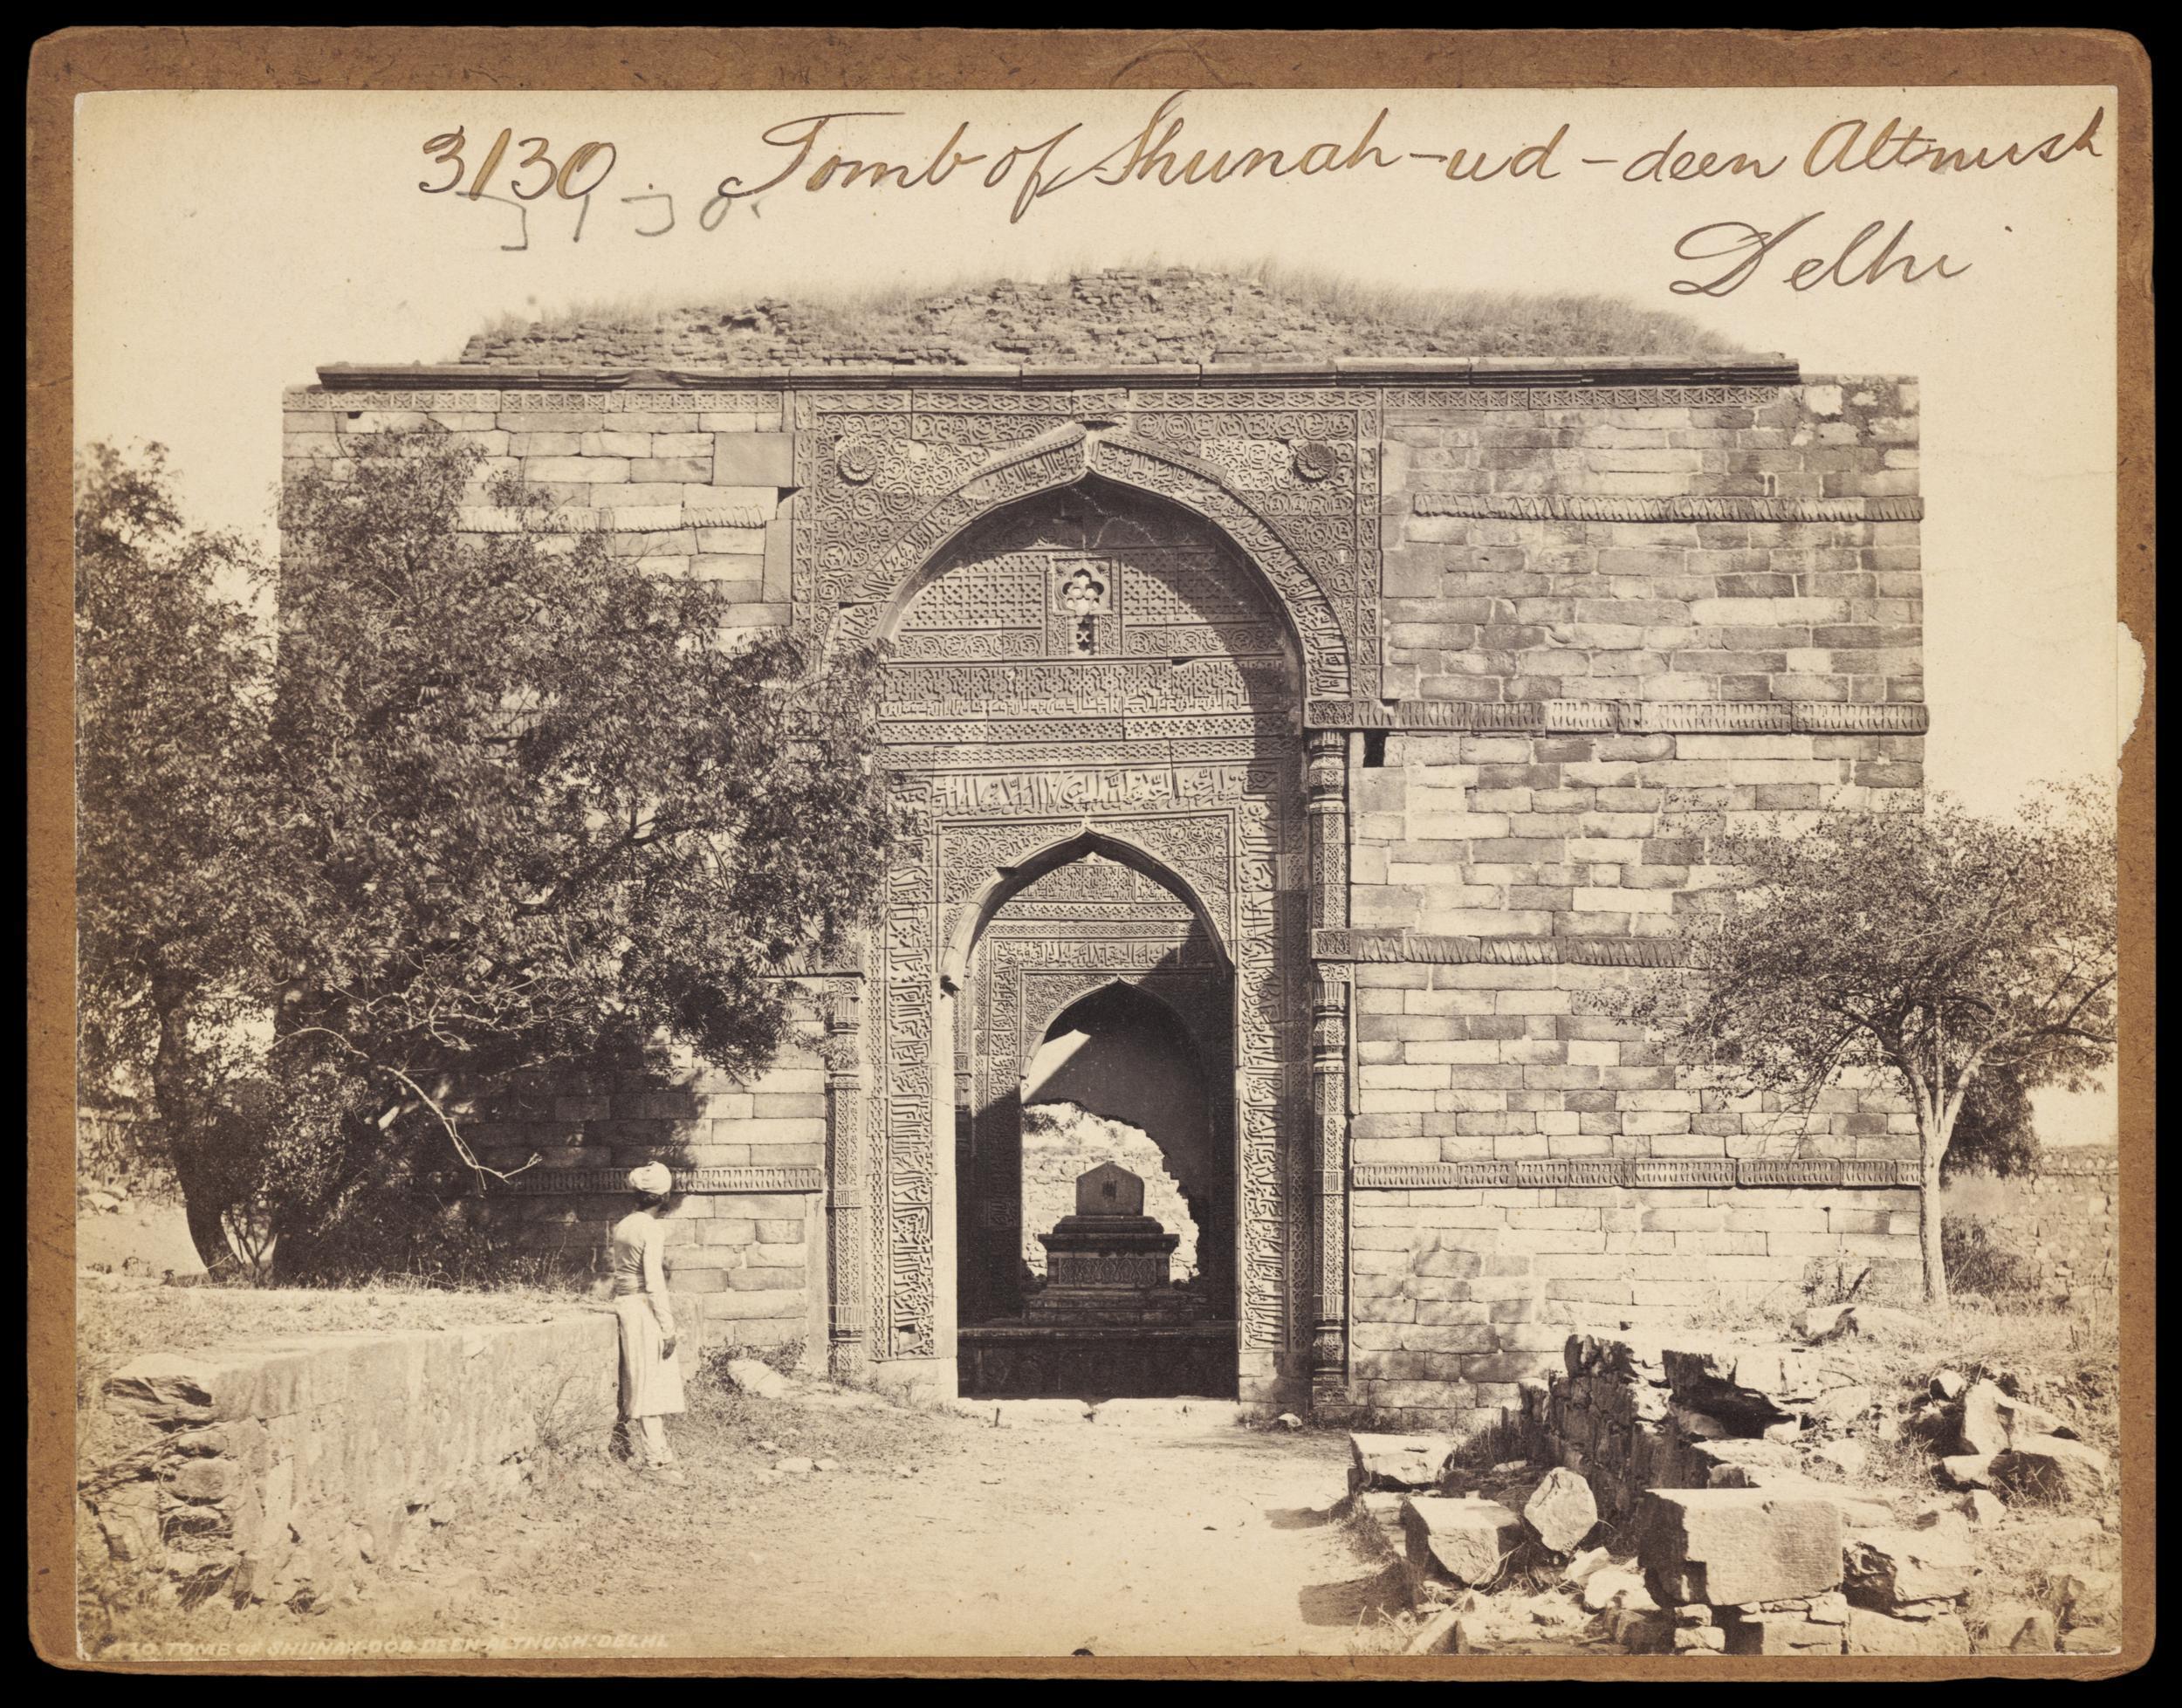 Tomb of Shams-ud-din Iltutmish in the Qutb complex, Delhi  - Mid 19th Century